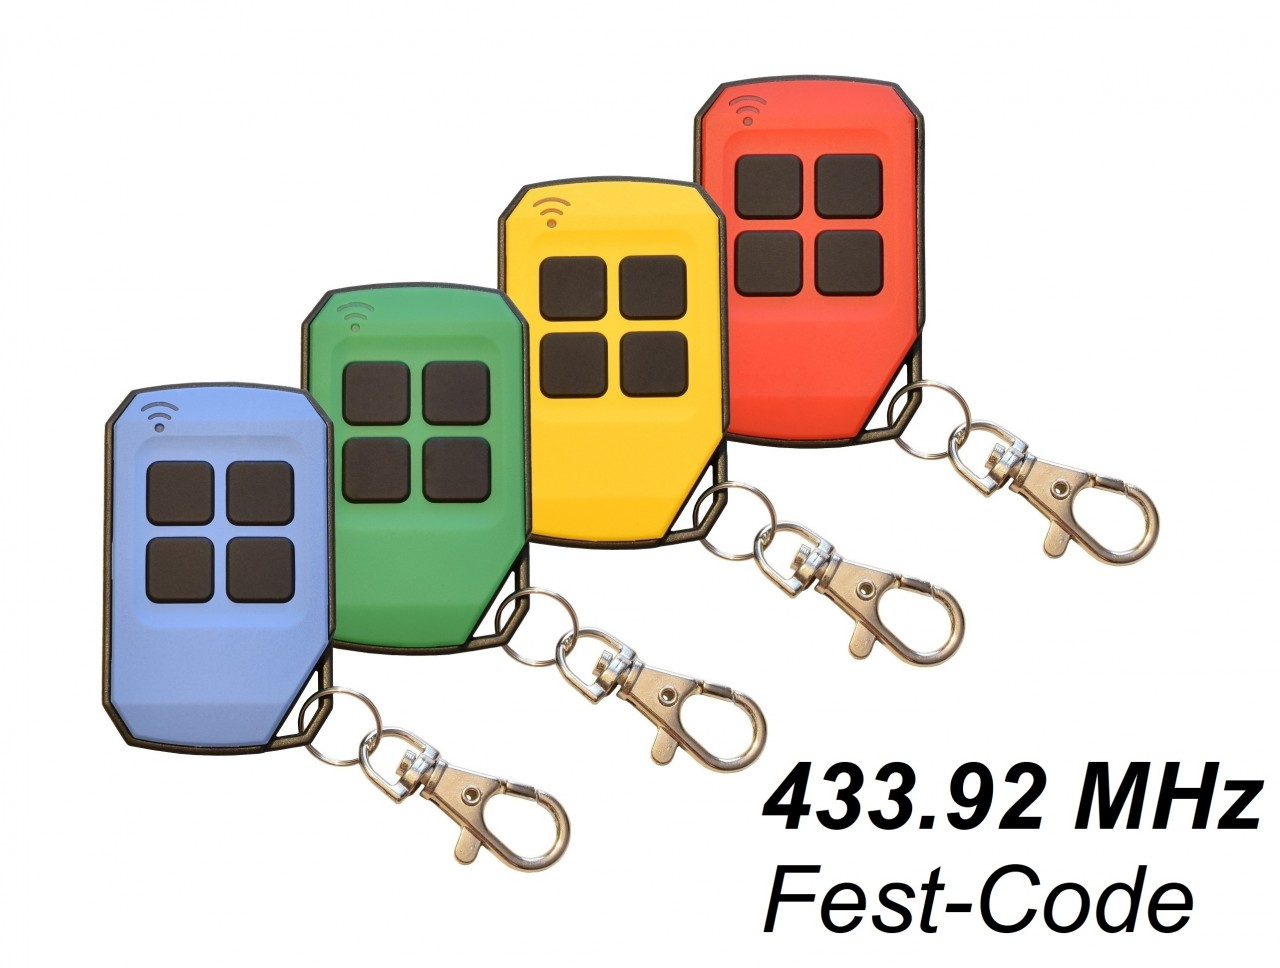 Schartec Universal Handsender 433 MHz Festcode farbig